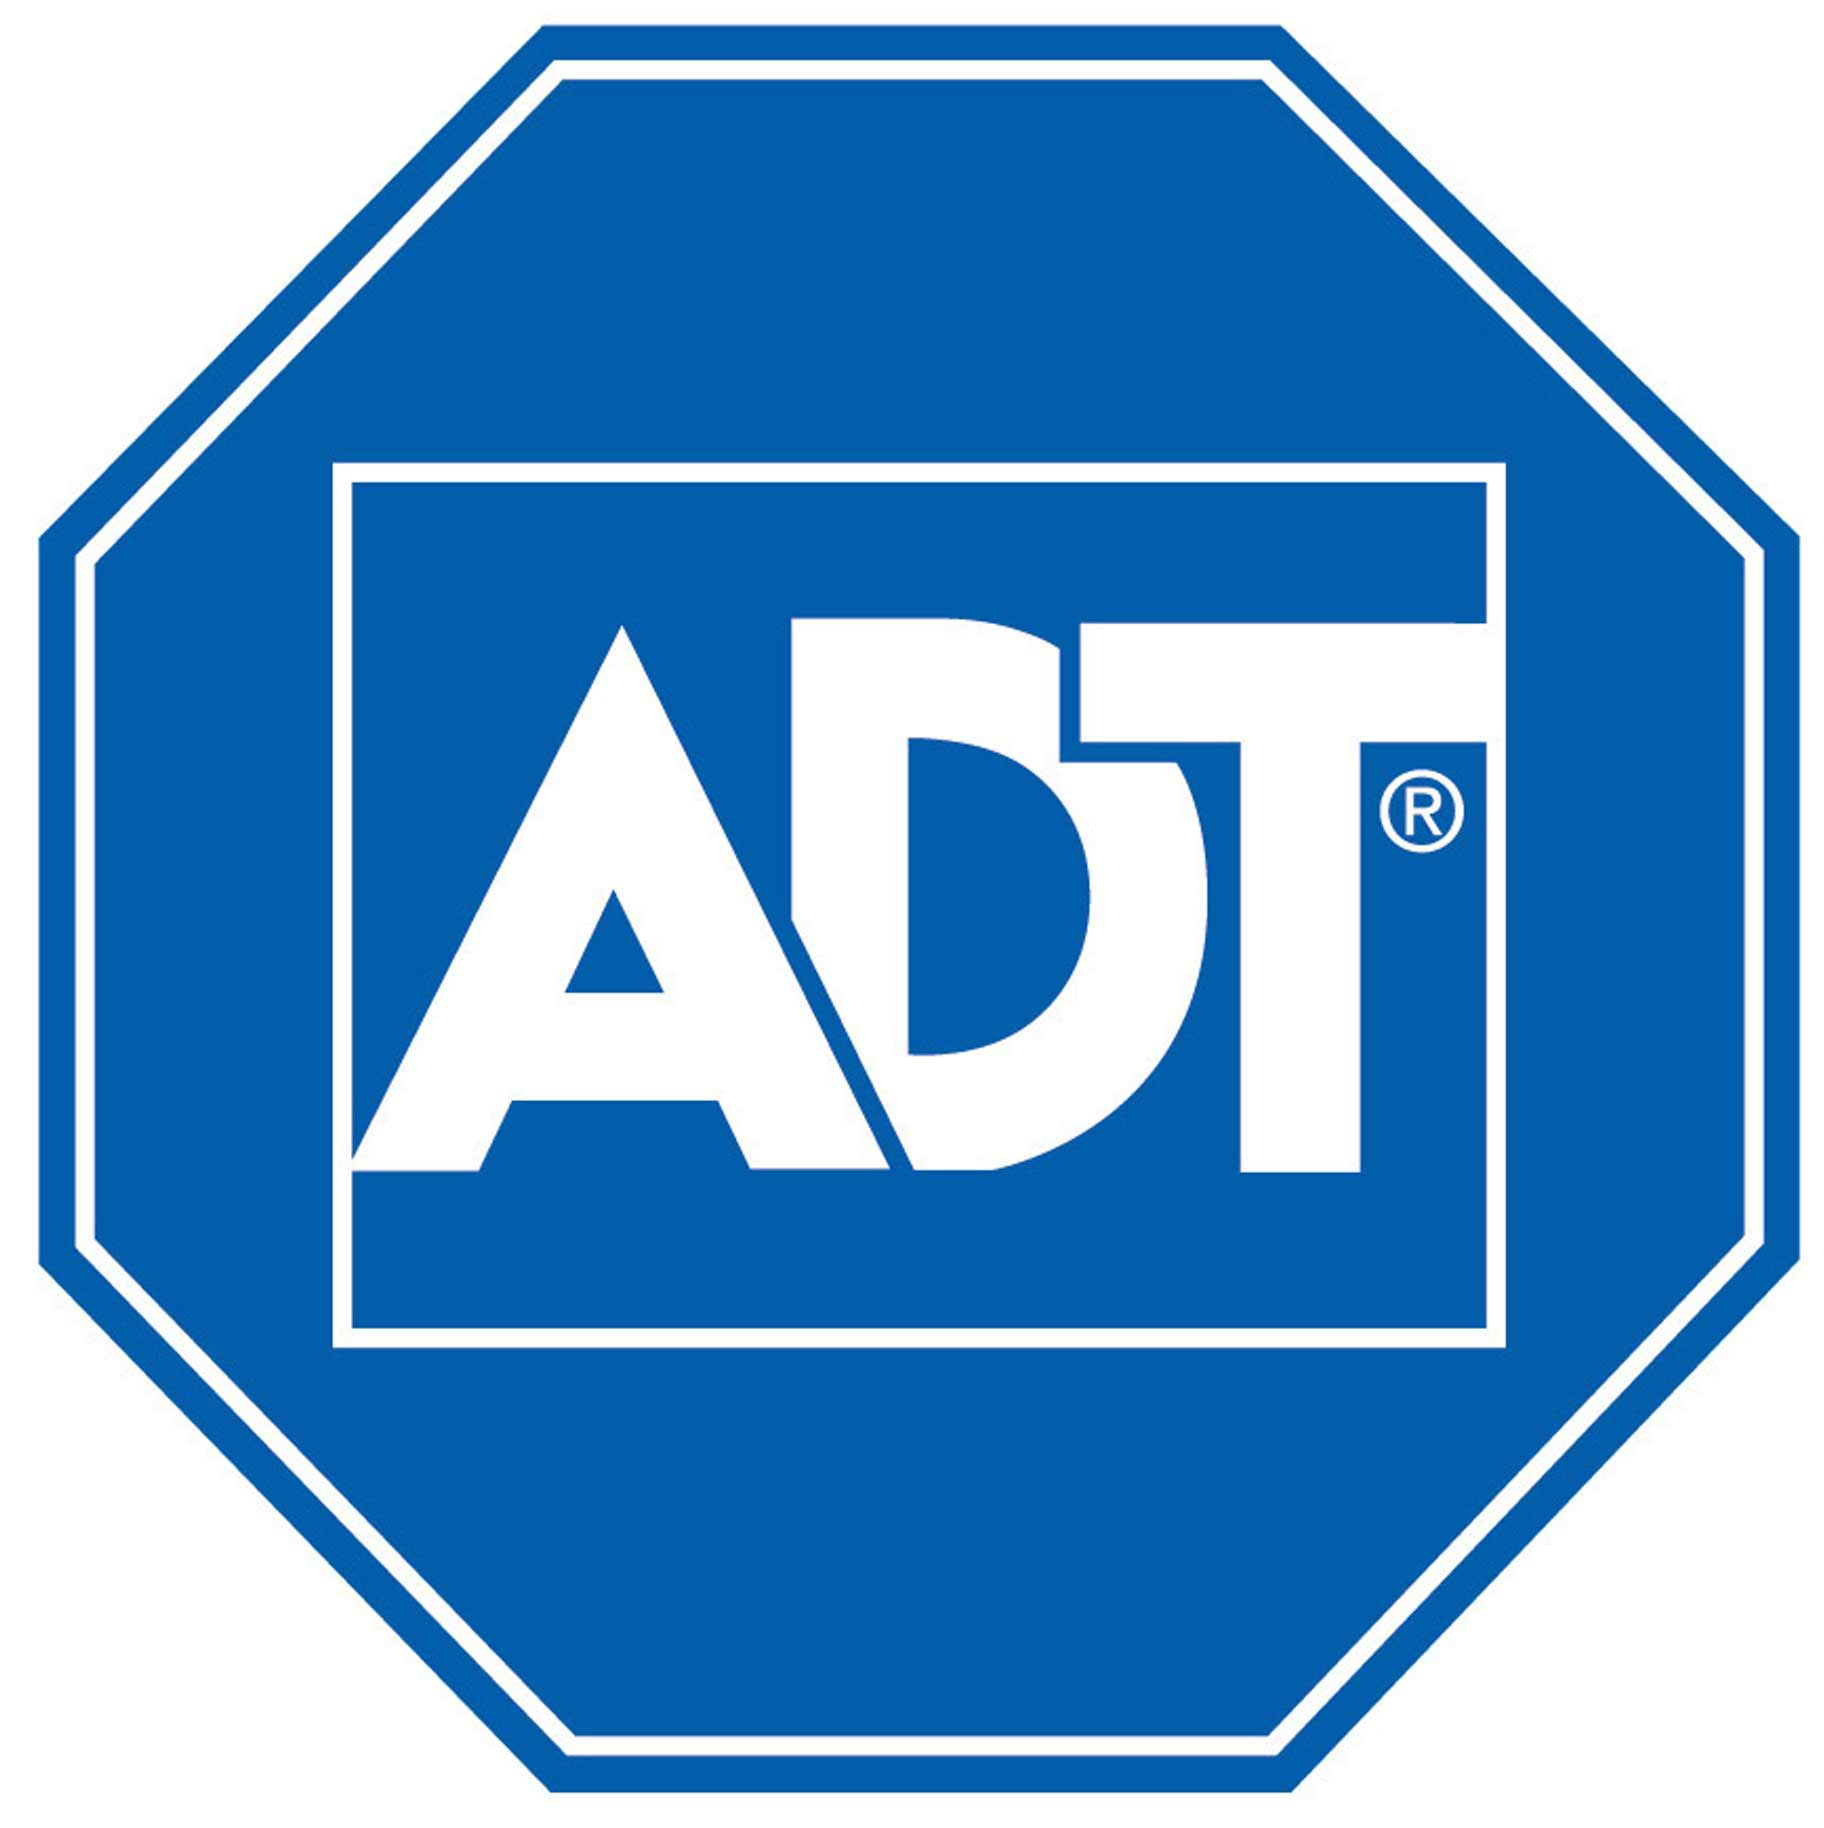 Free Adt Logos, Download Free Clip Art, Free Clip Art on.